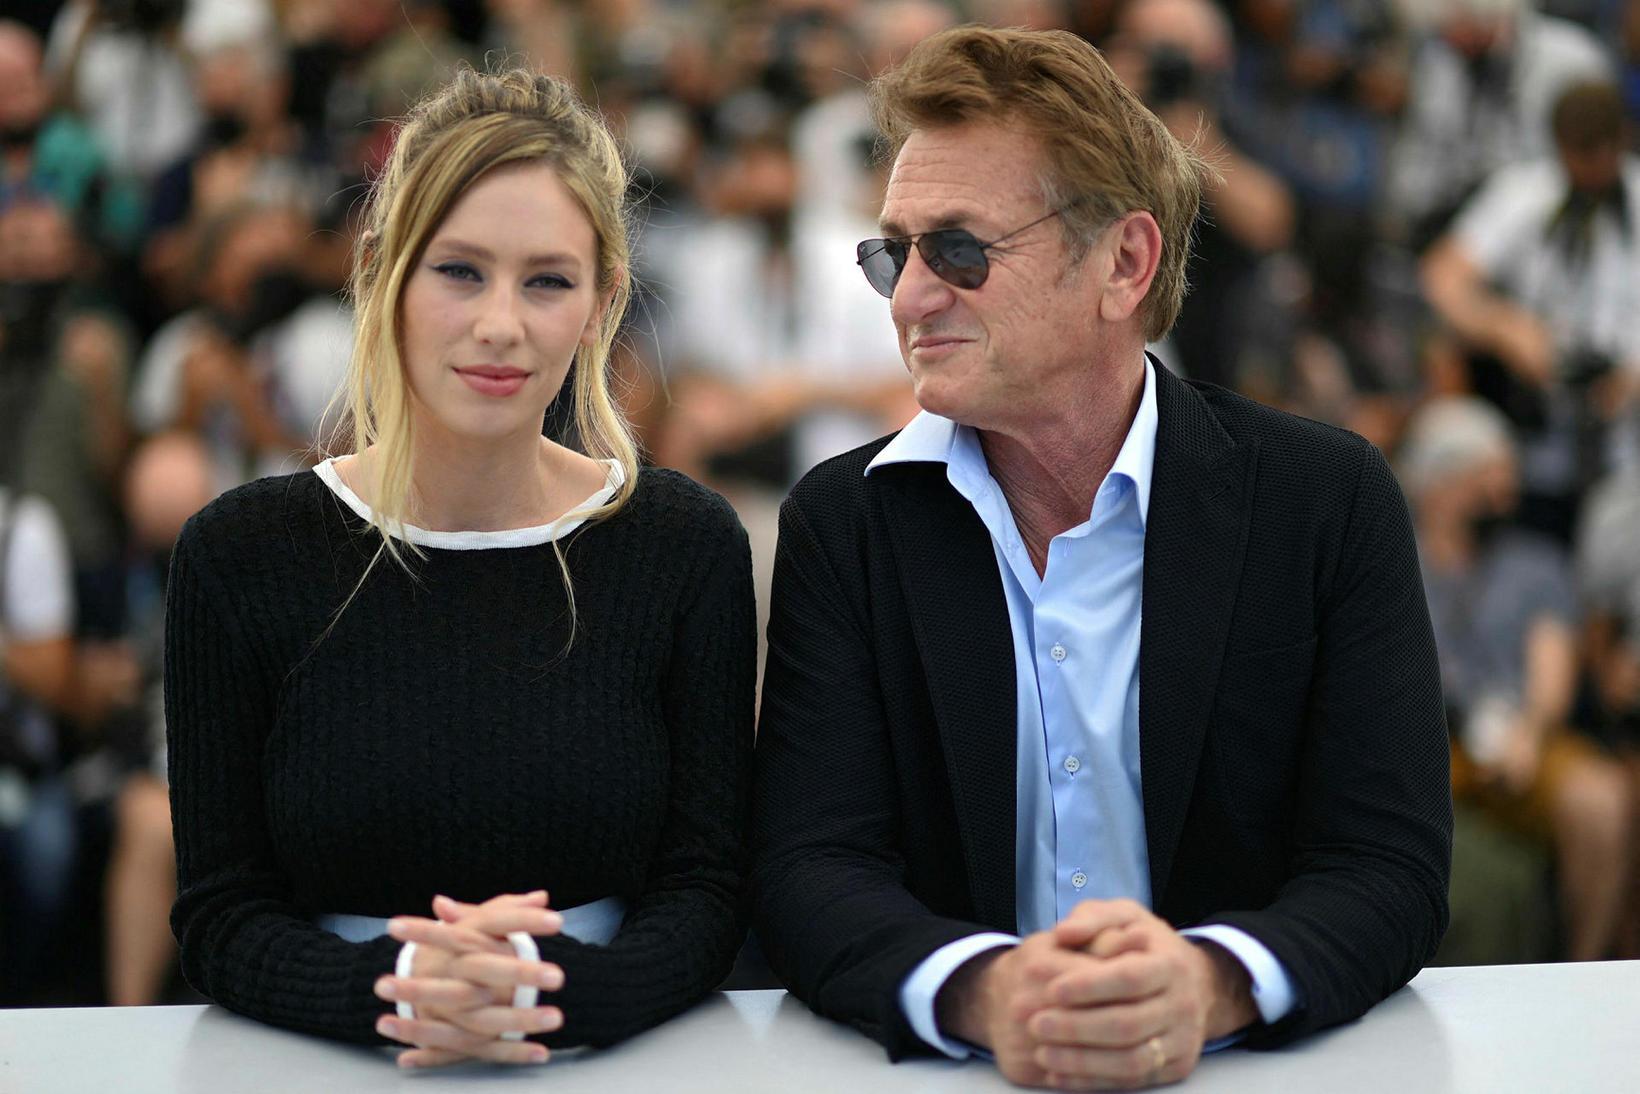 Feðginin Dylan Penn og Sean Penn.